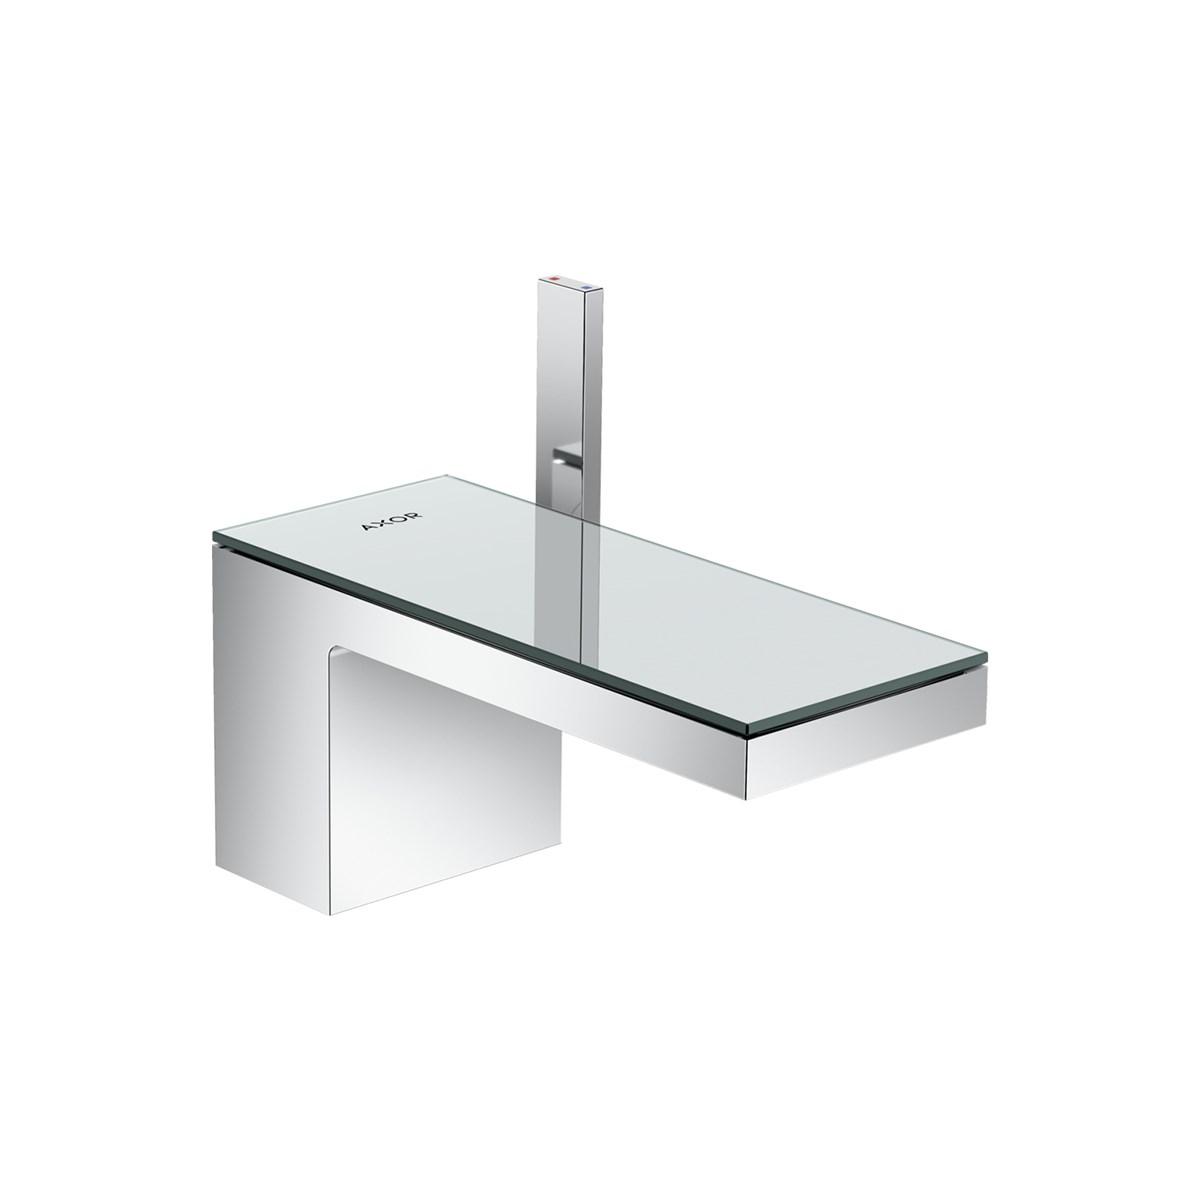 Hansgrohe-Phoenix-Design-AXOR-MyEdition-Basin-Mixer-70-47010000-Matisse-1